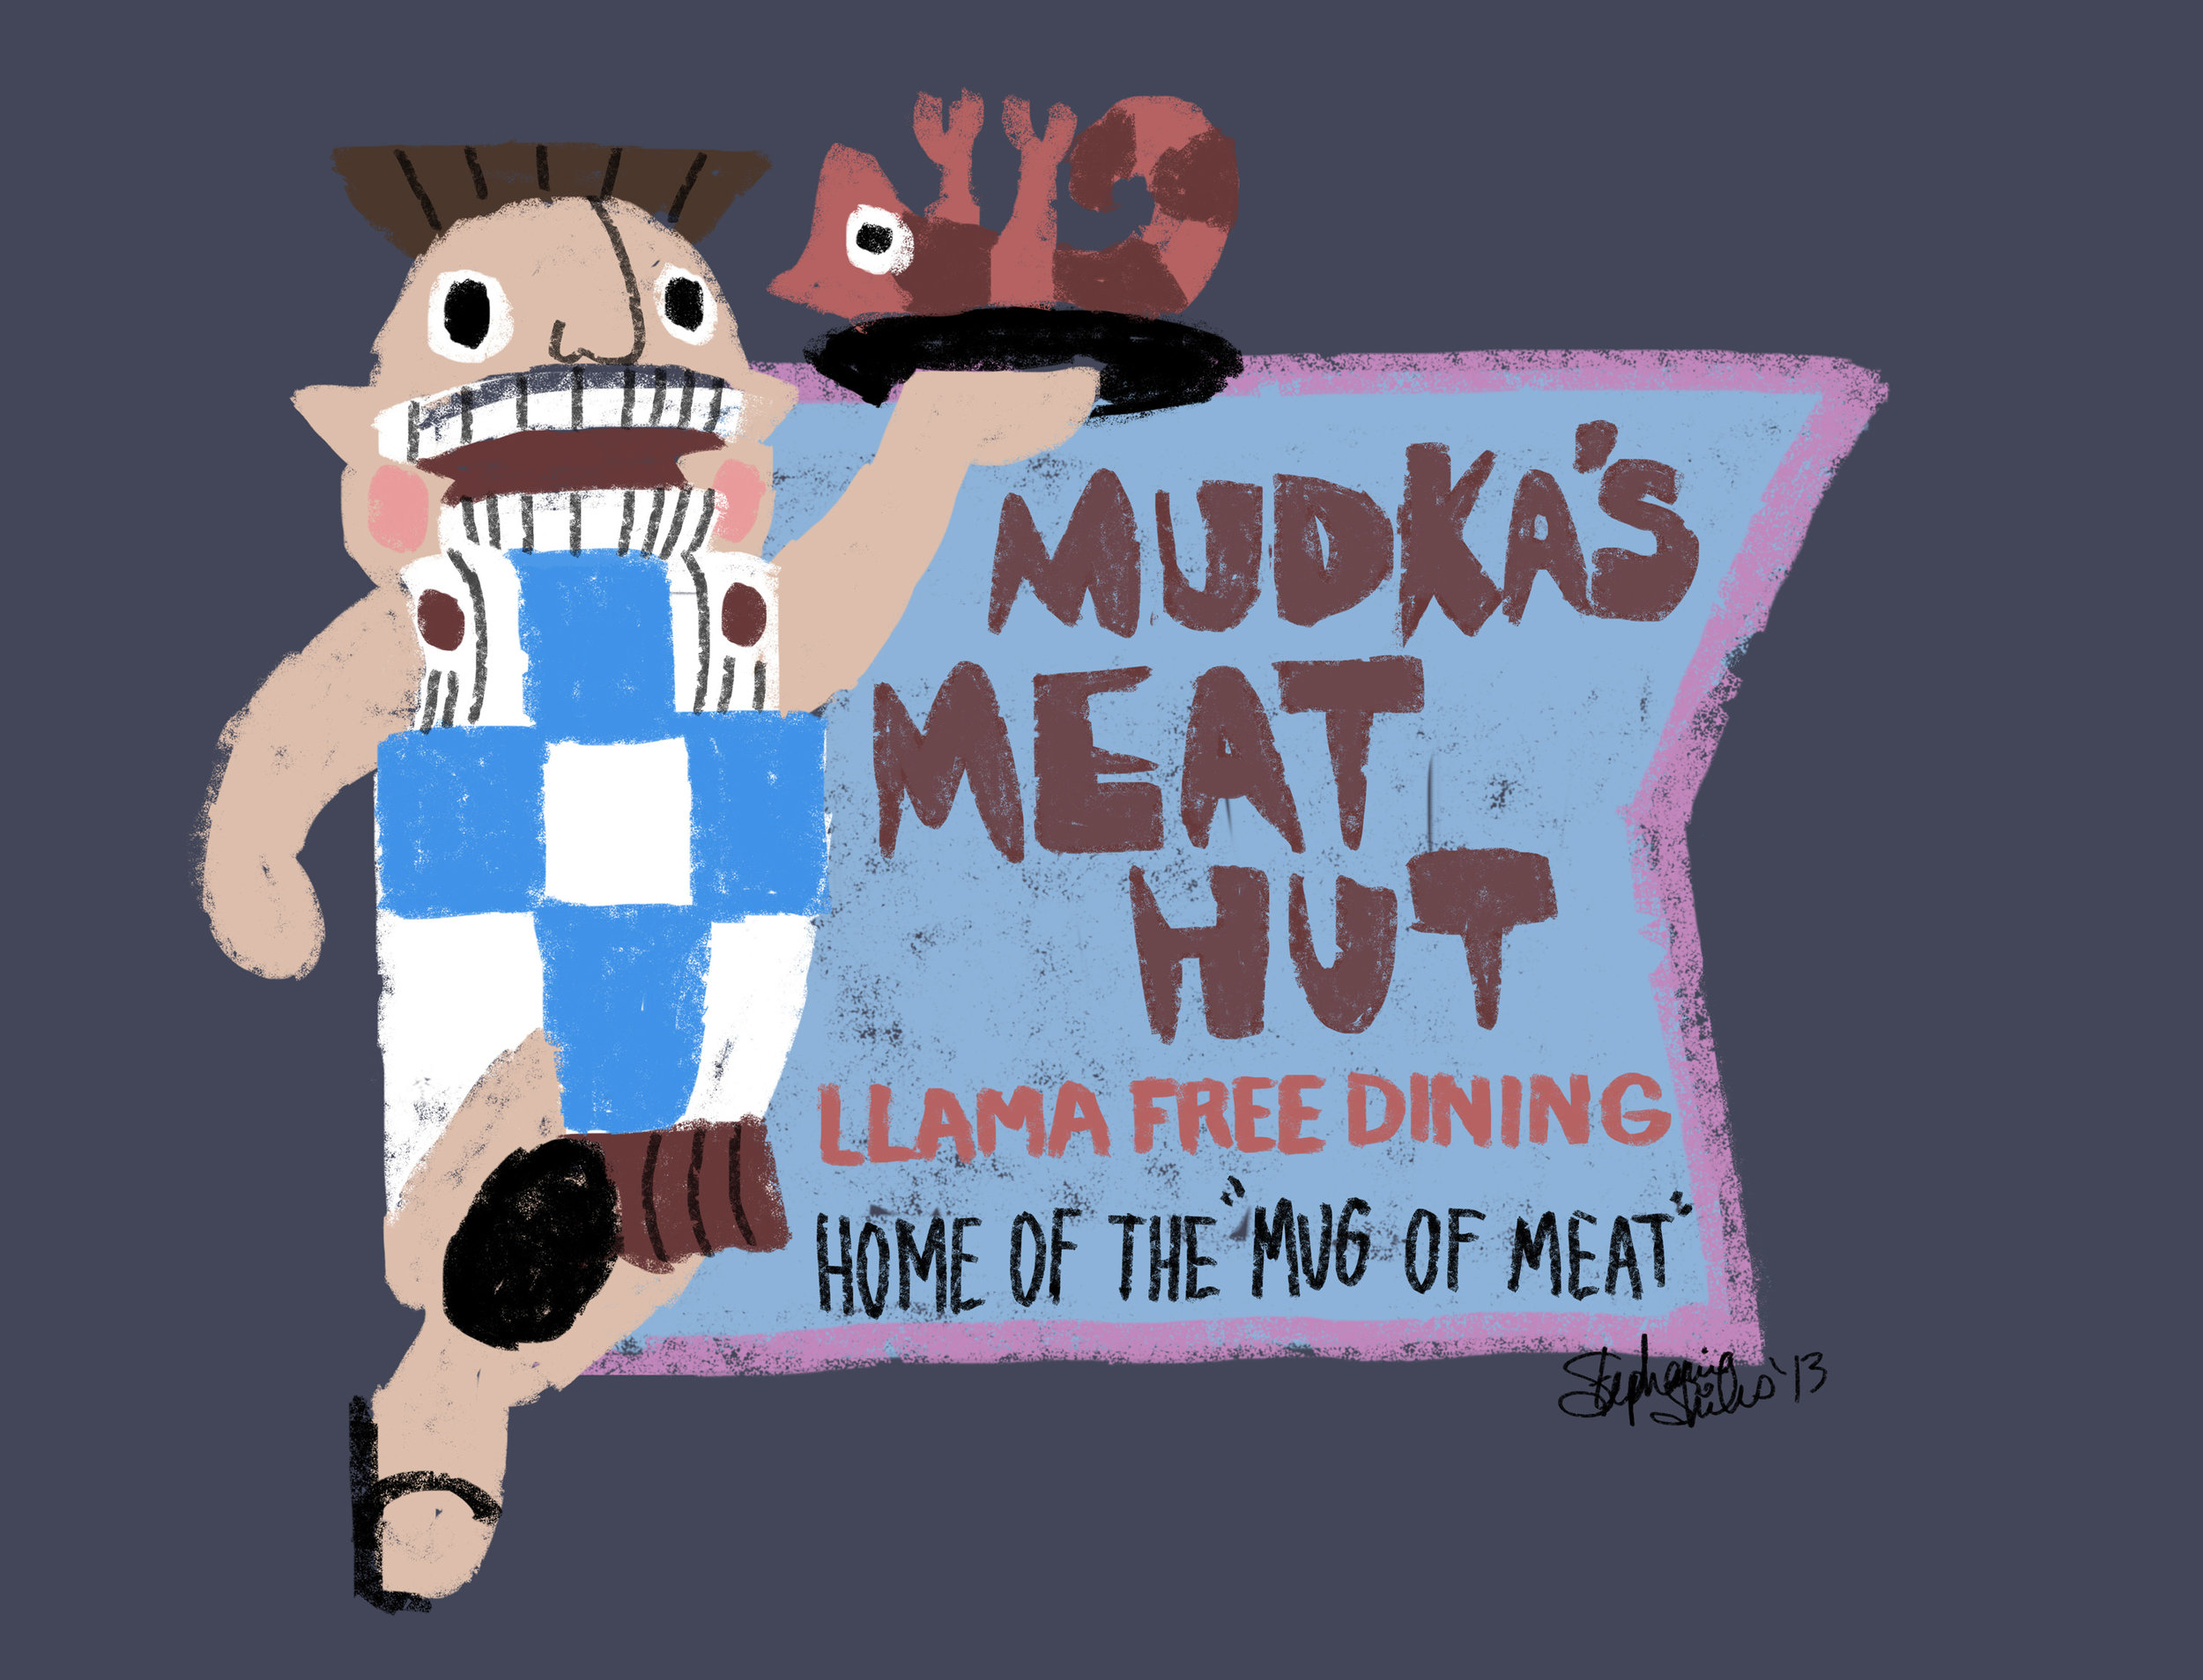 Mudka's Meat Hut Digital Illustration